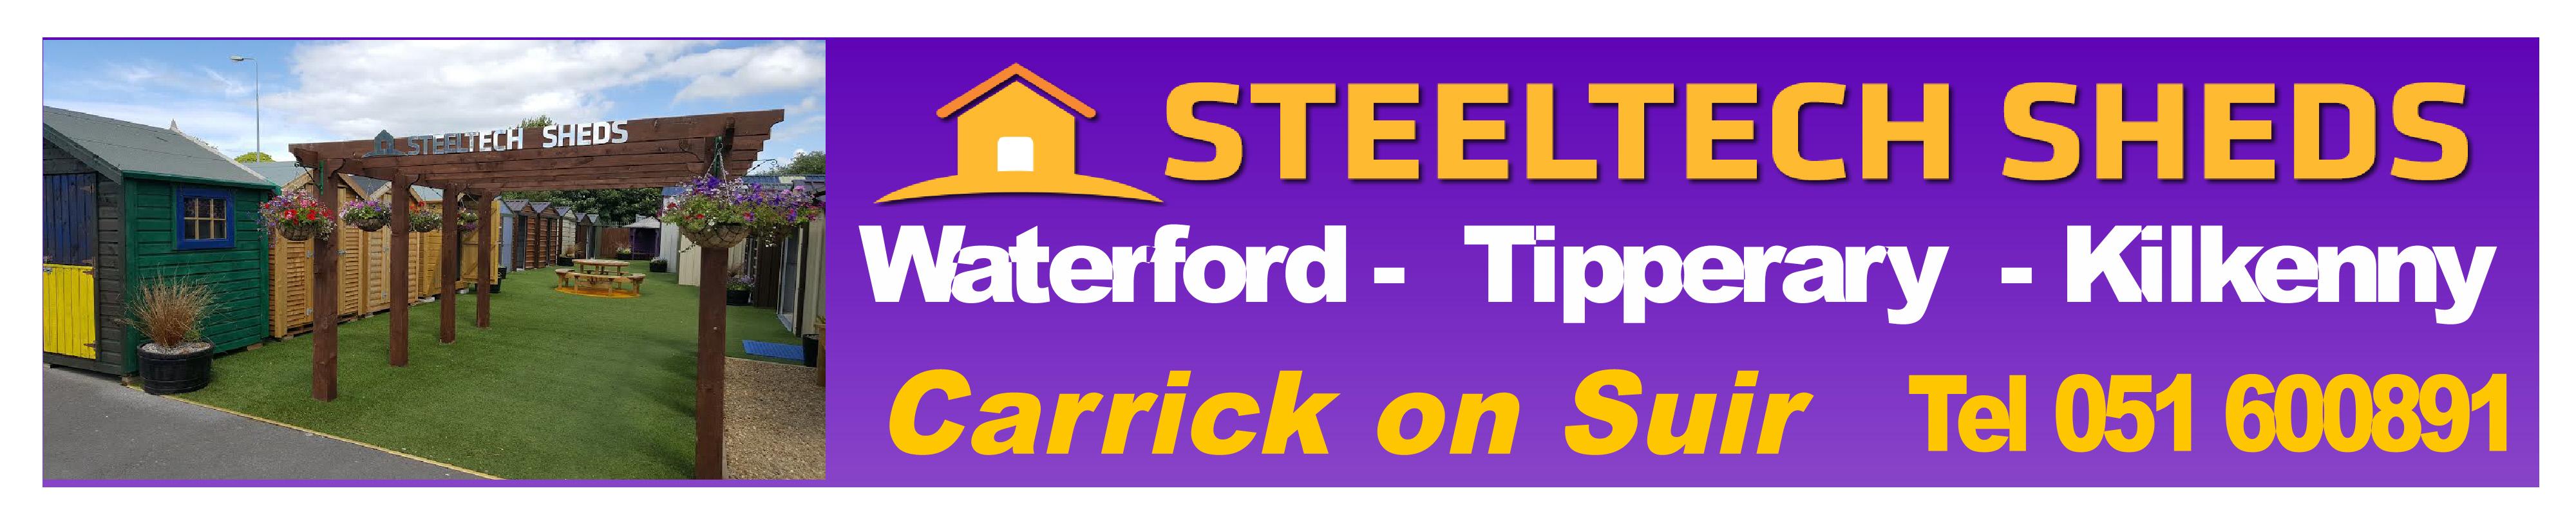 Garden Sheds Kilkenny steeltech sheds | steel sheds in carrick on suir, co.tipperary